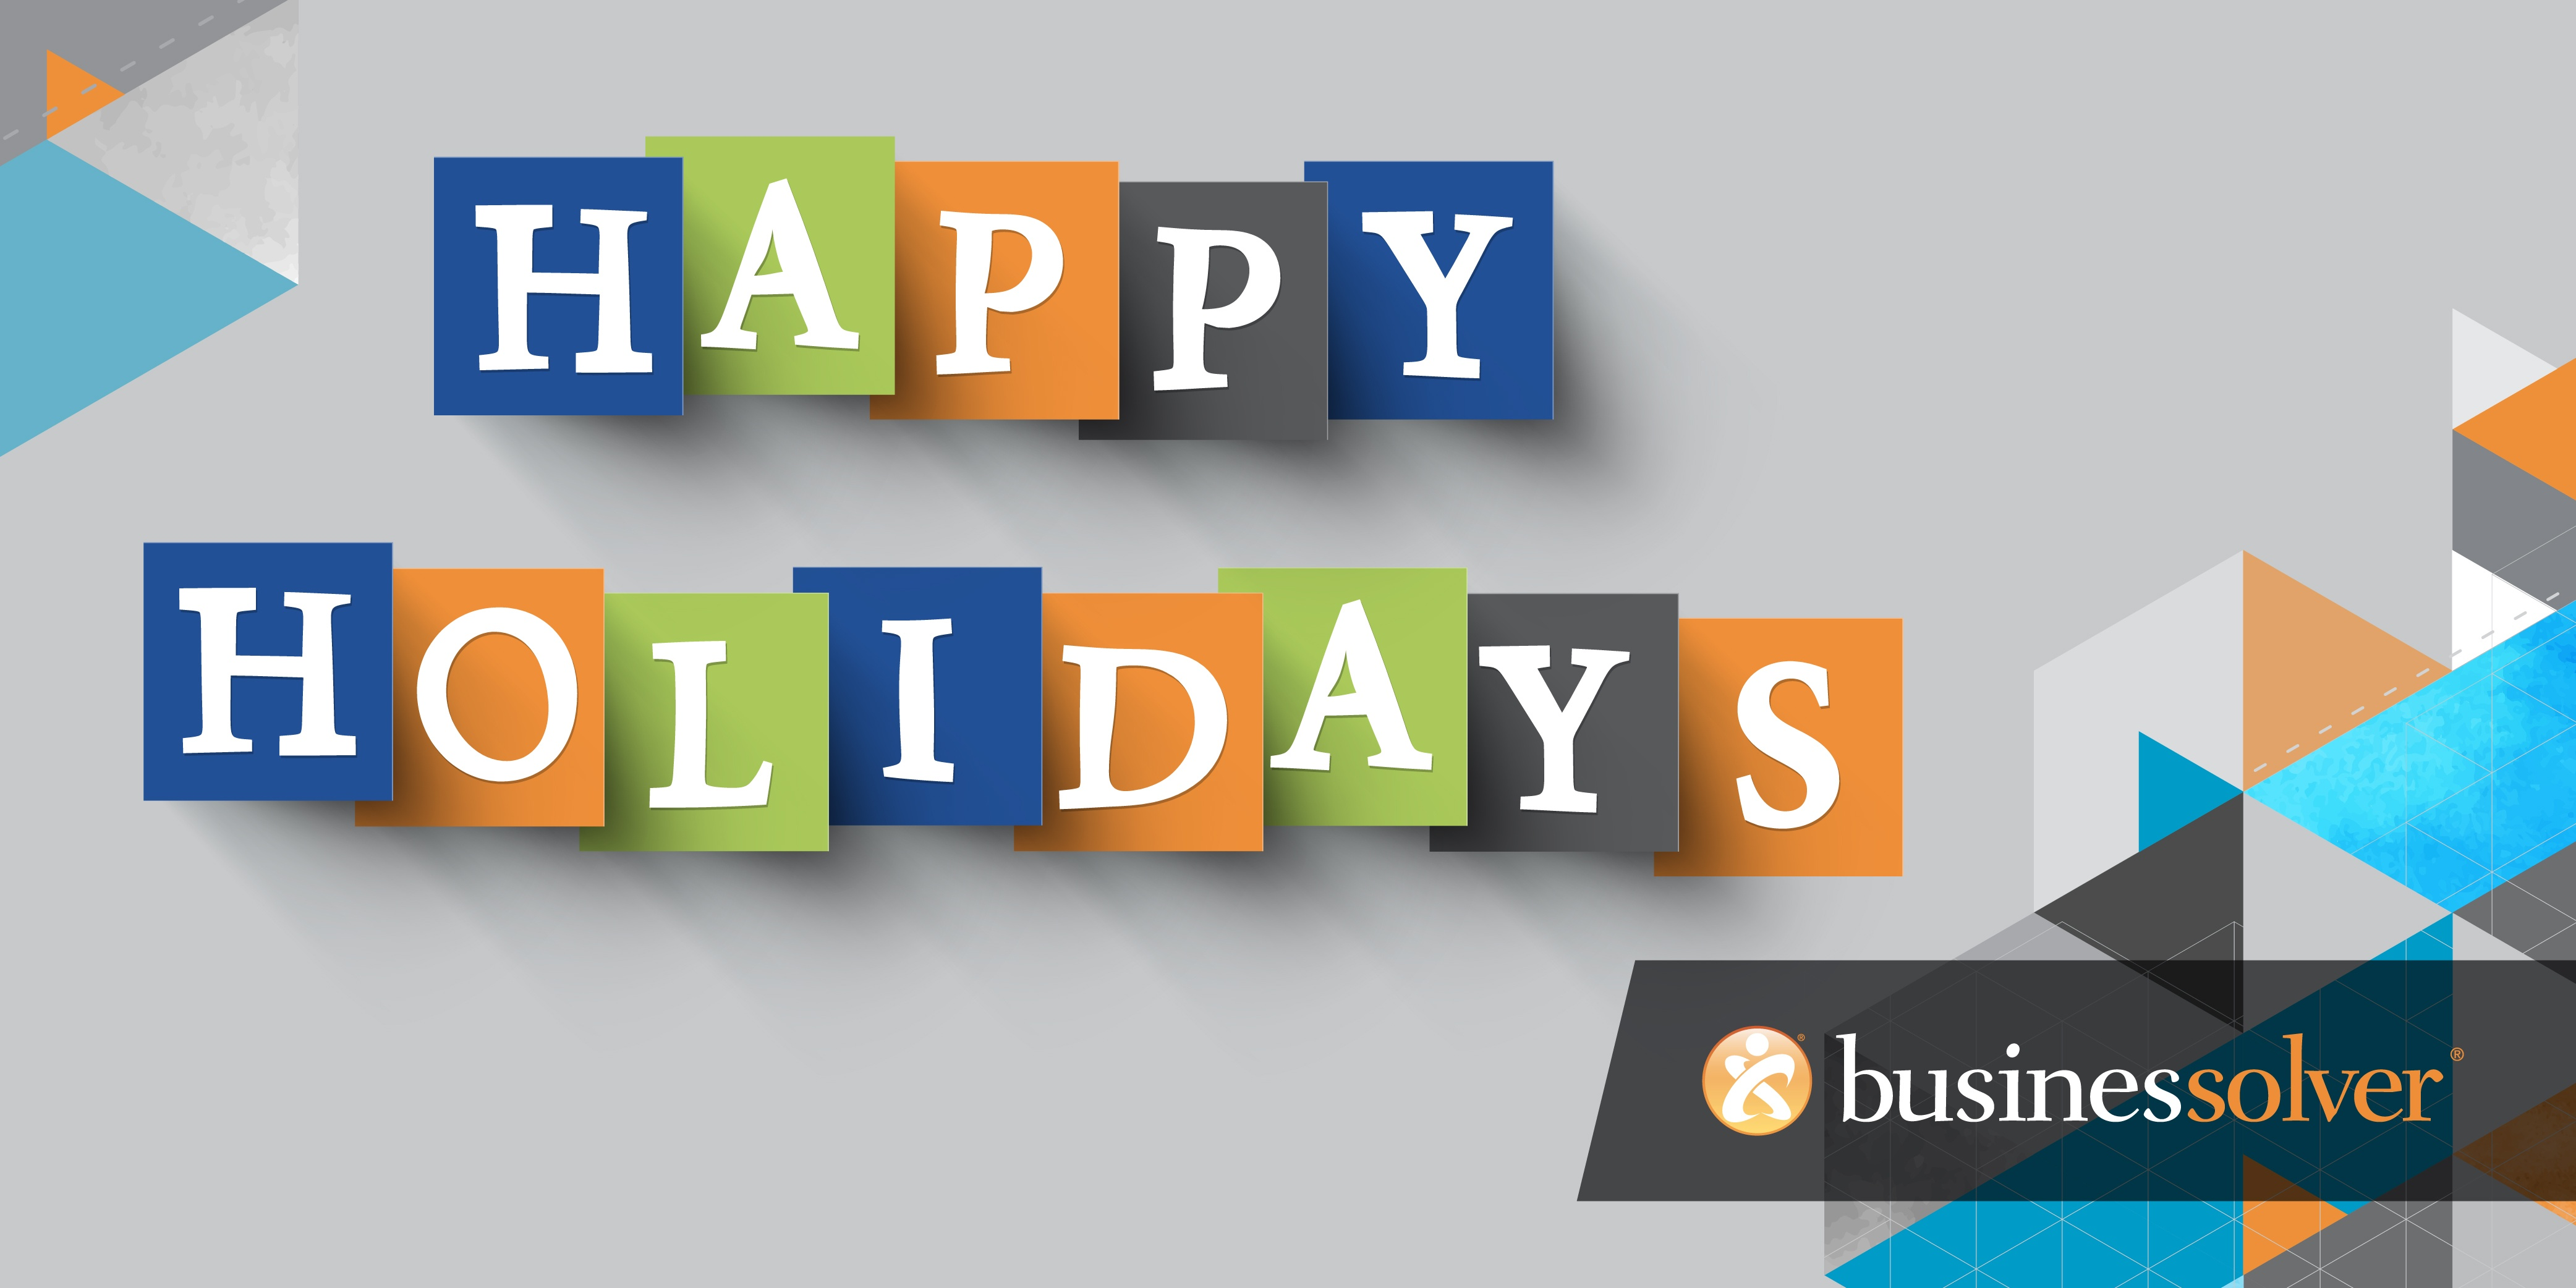 happy holidays image.jpg